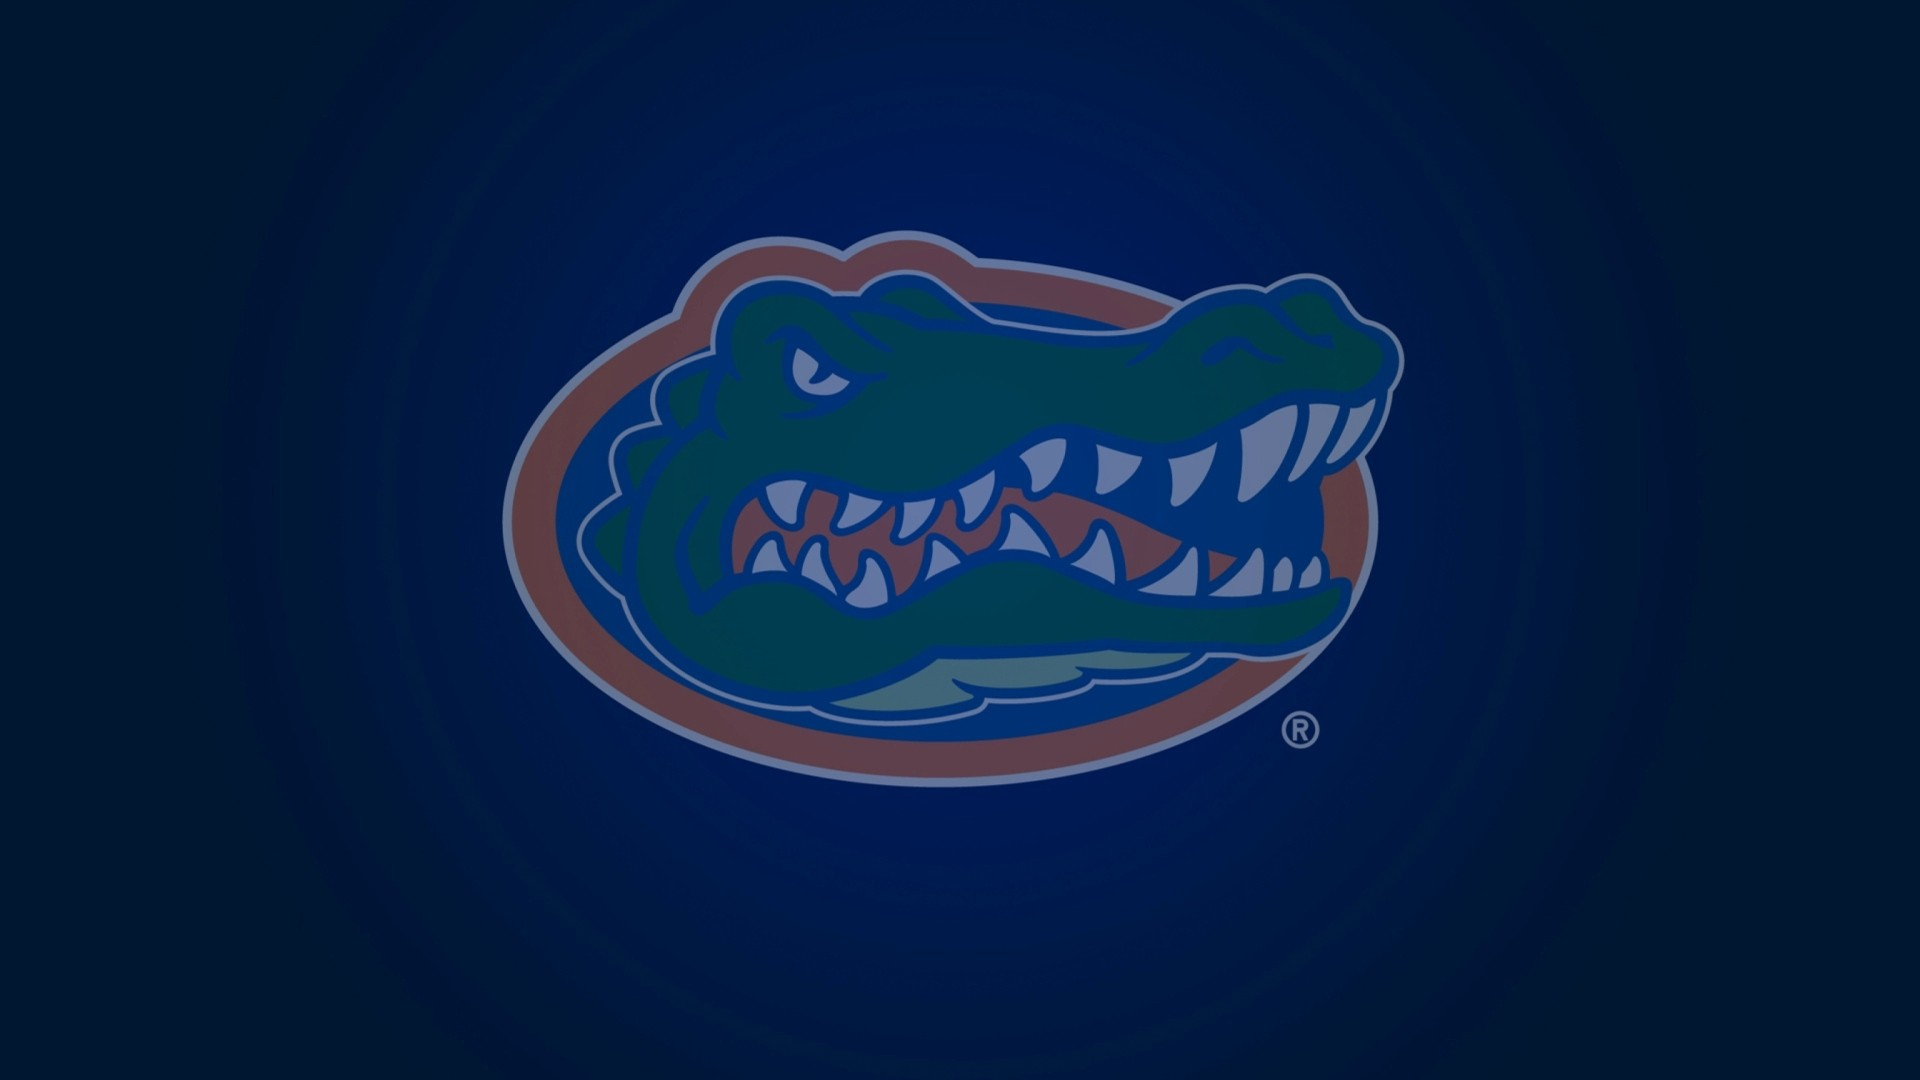 Florida Gators Wallpaper and Background